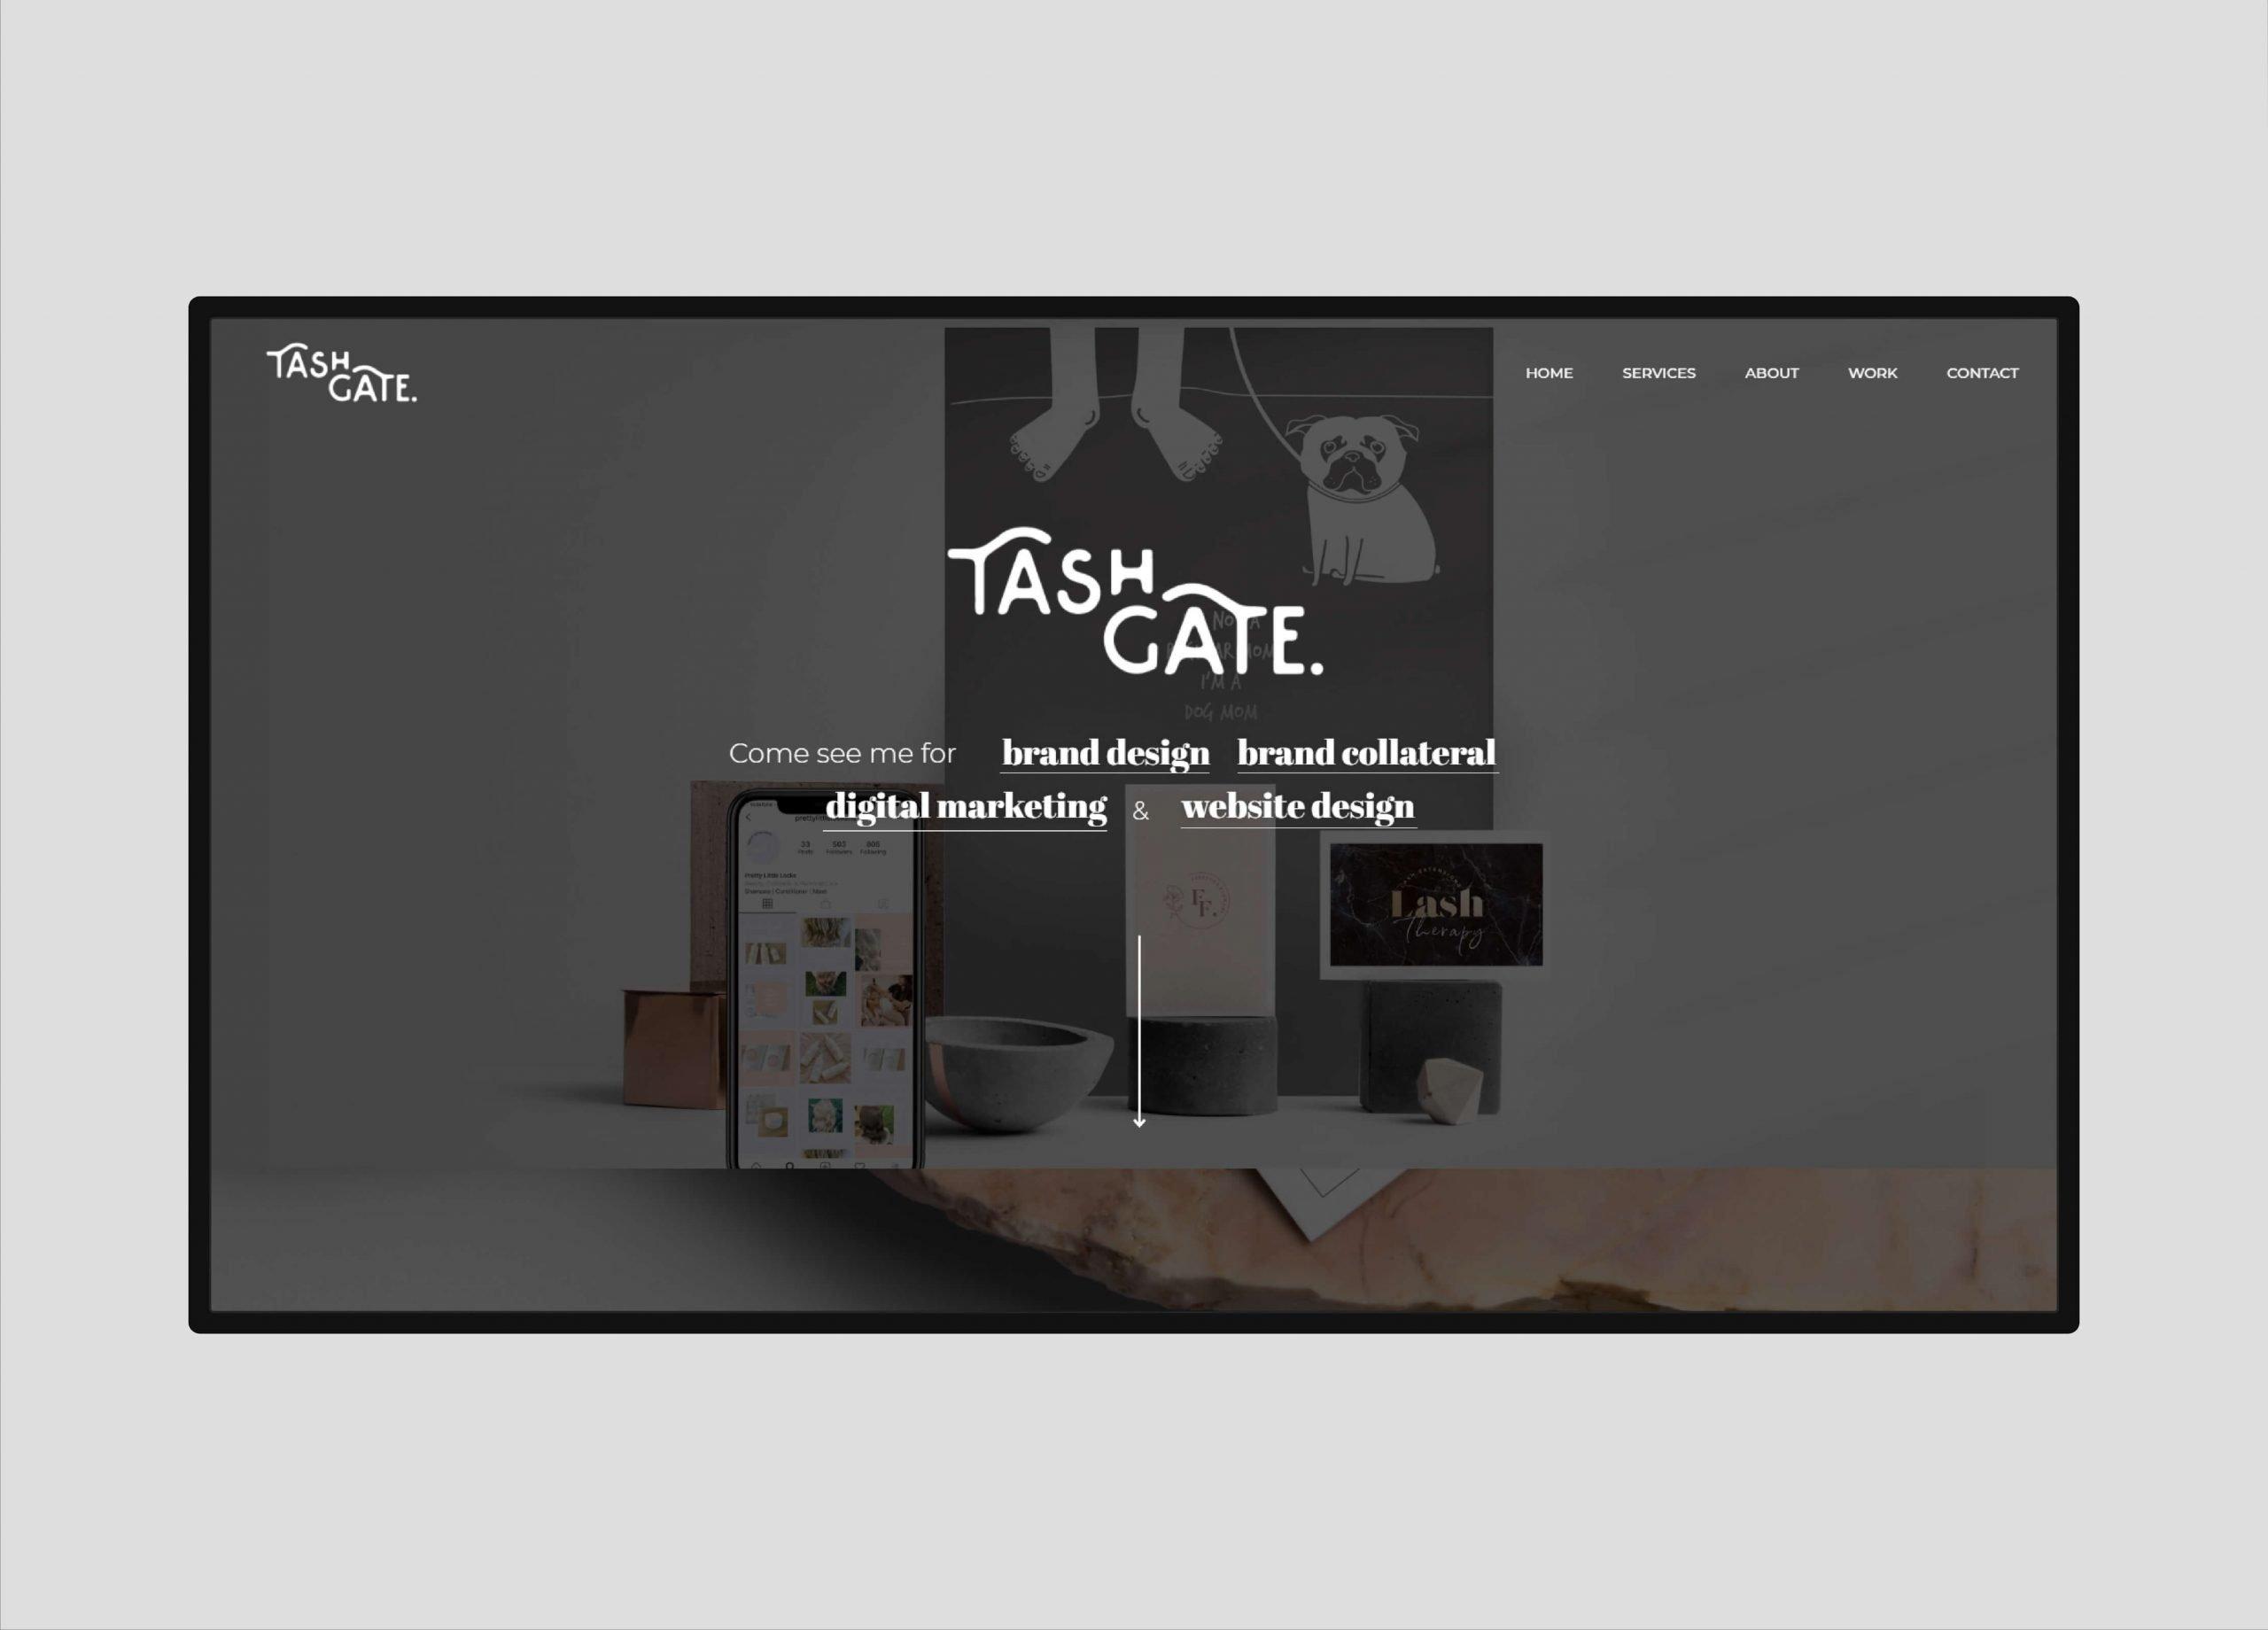 website-design-website-development-tash-gate